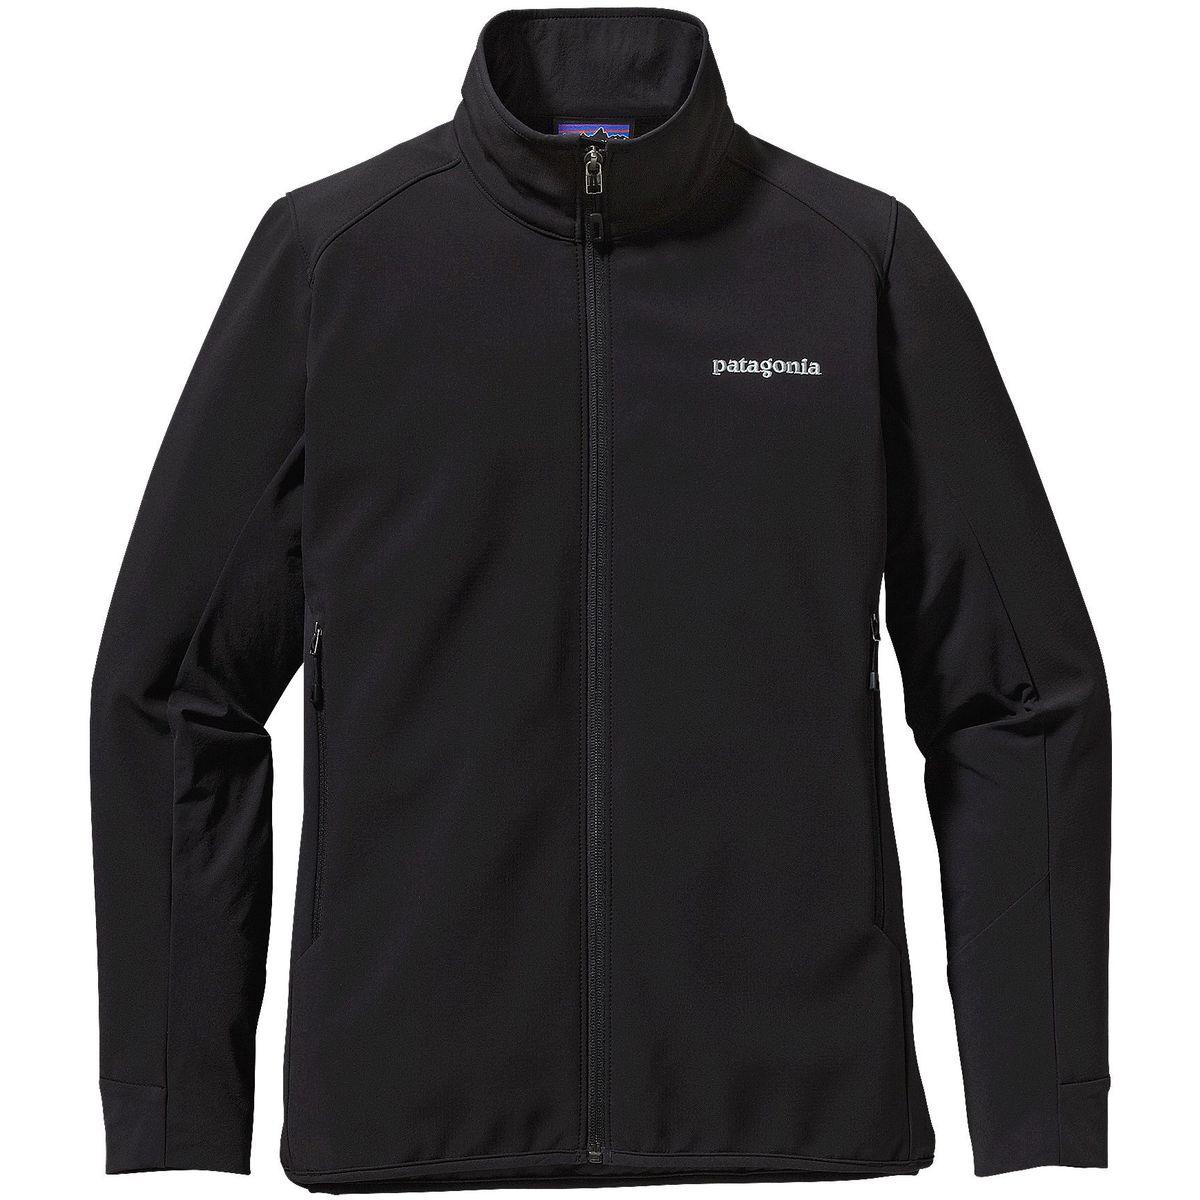 Patagonia Adze Hybrid Softshell Jacket - Women